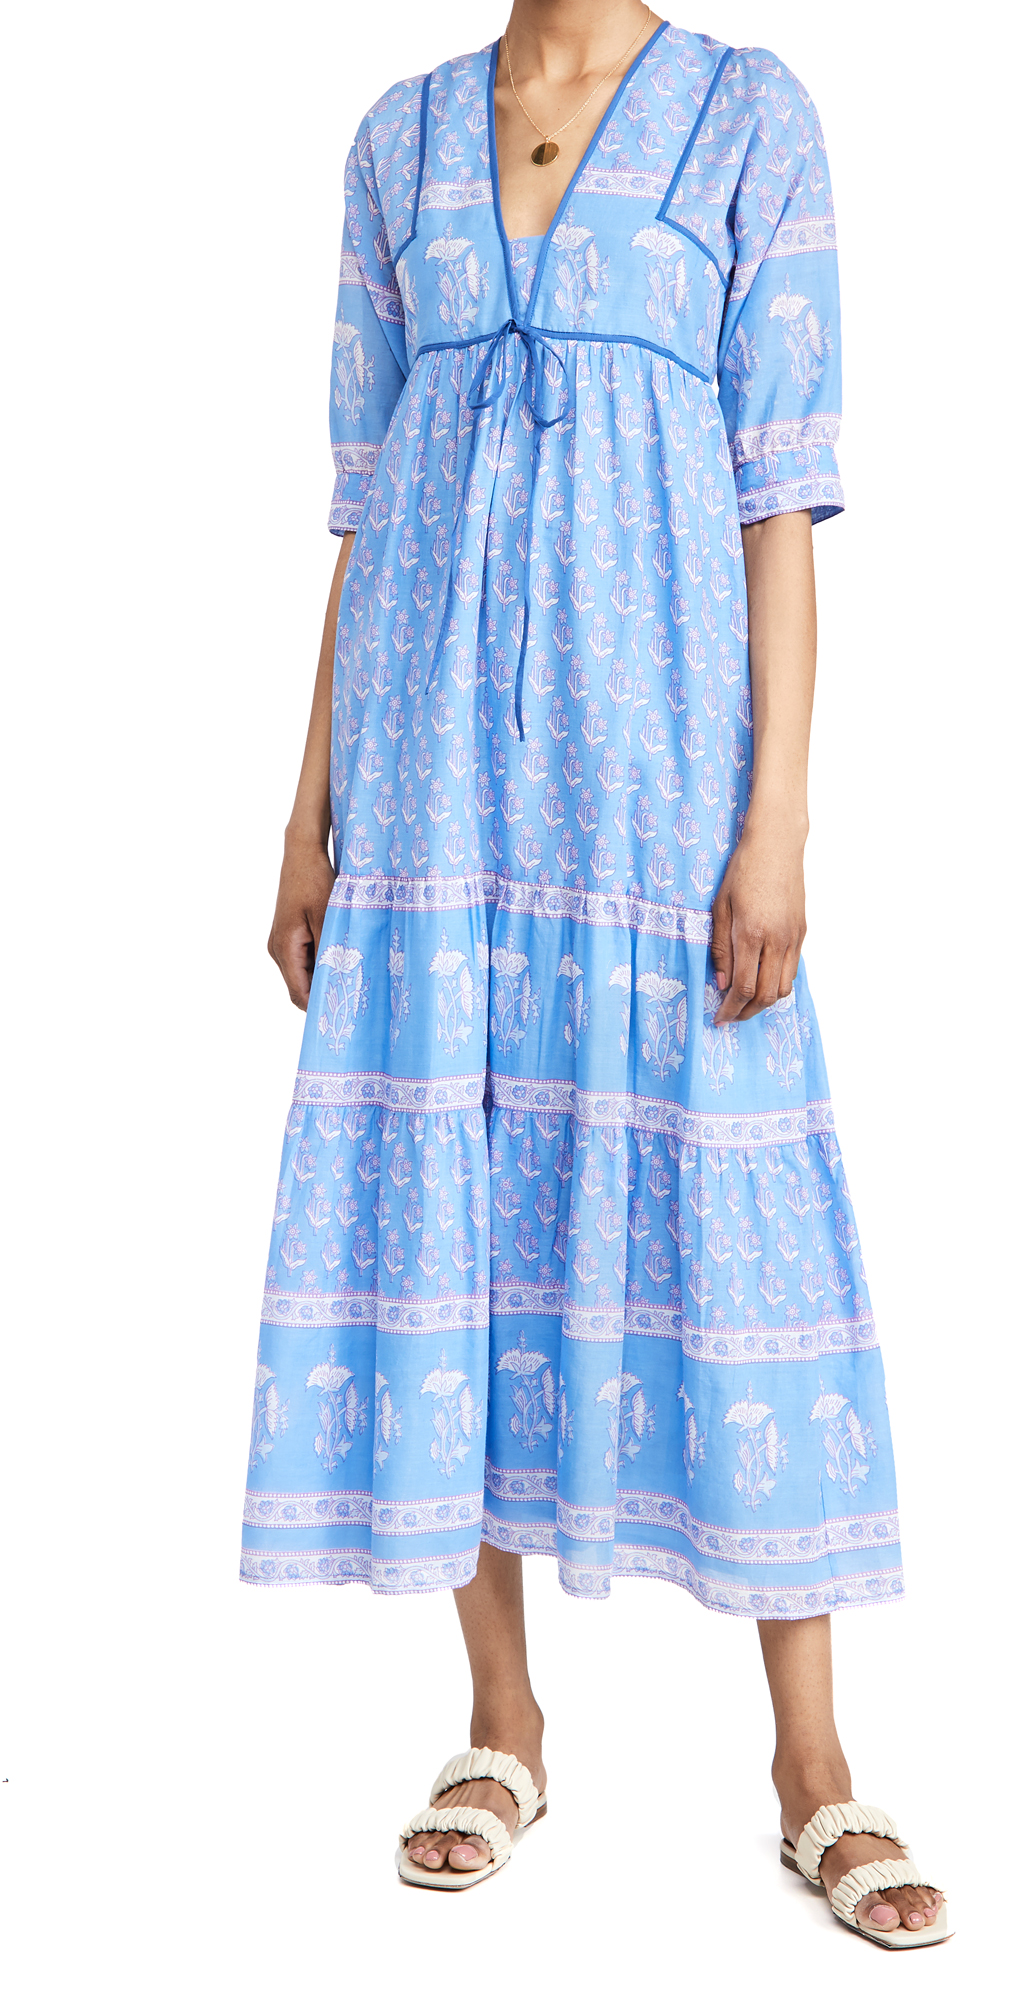 Antik Batik Mori Long Dress